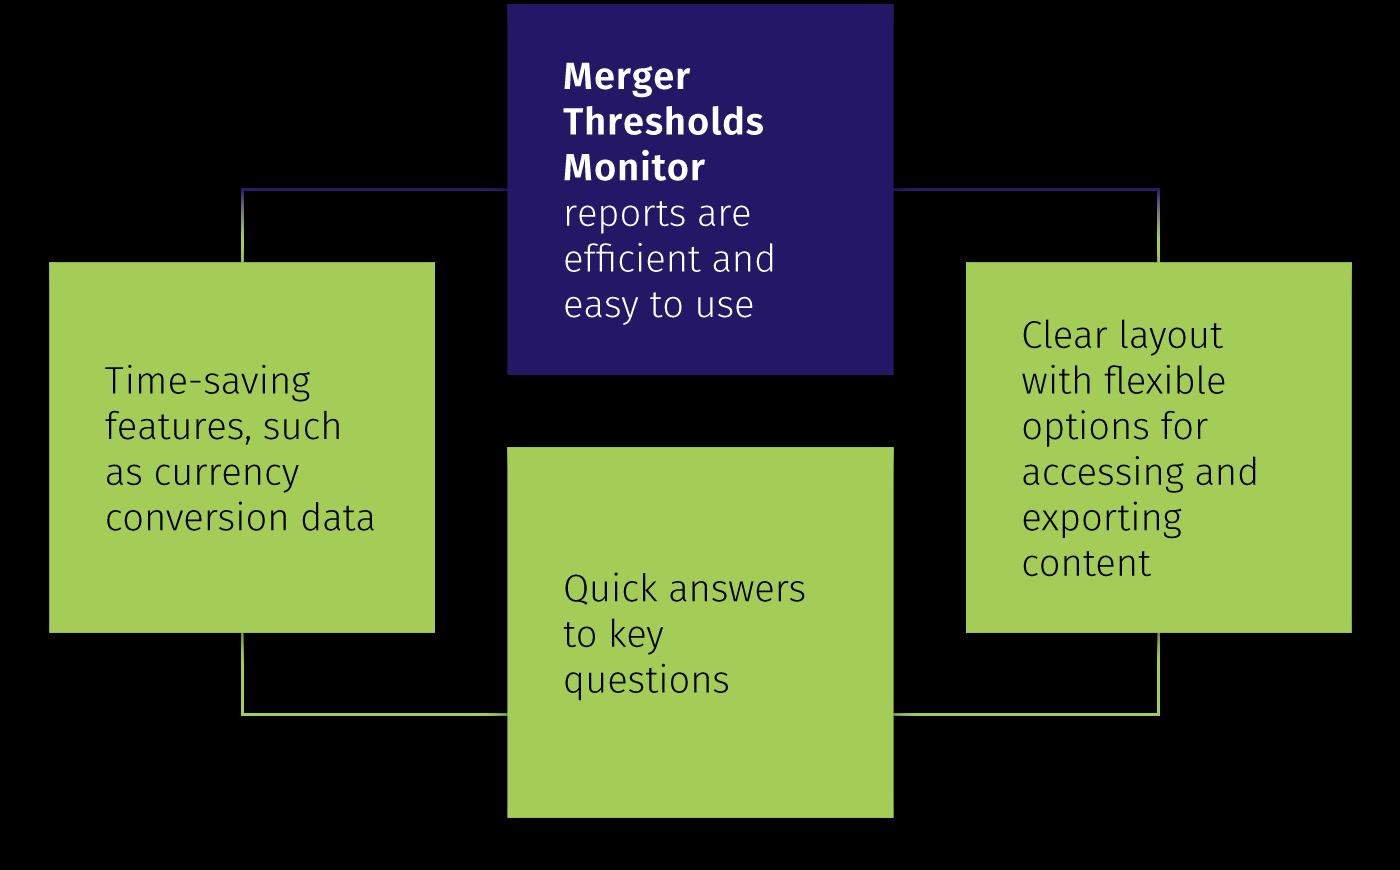 Flow chart Merger Thresholds Monitor